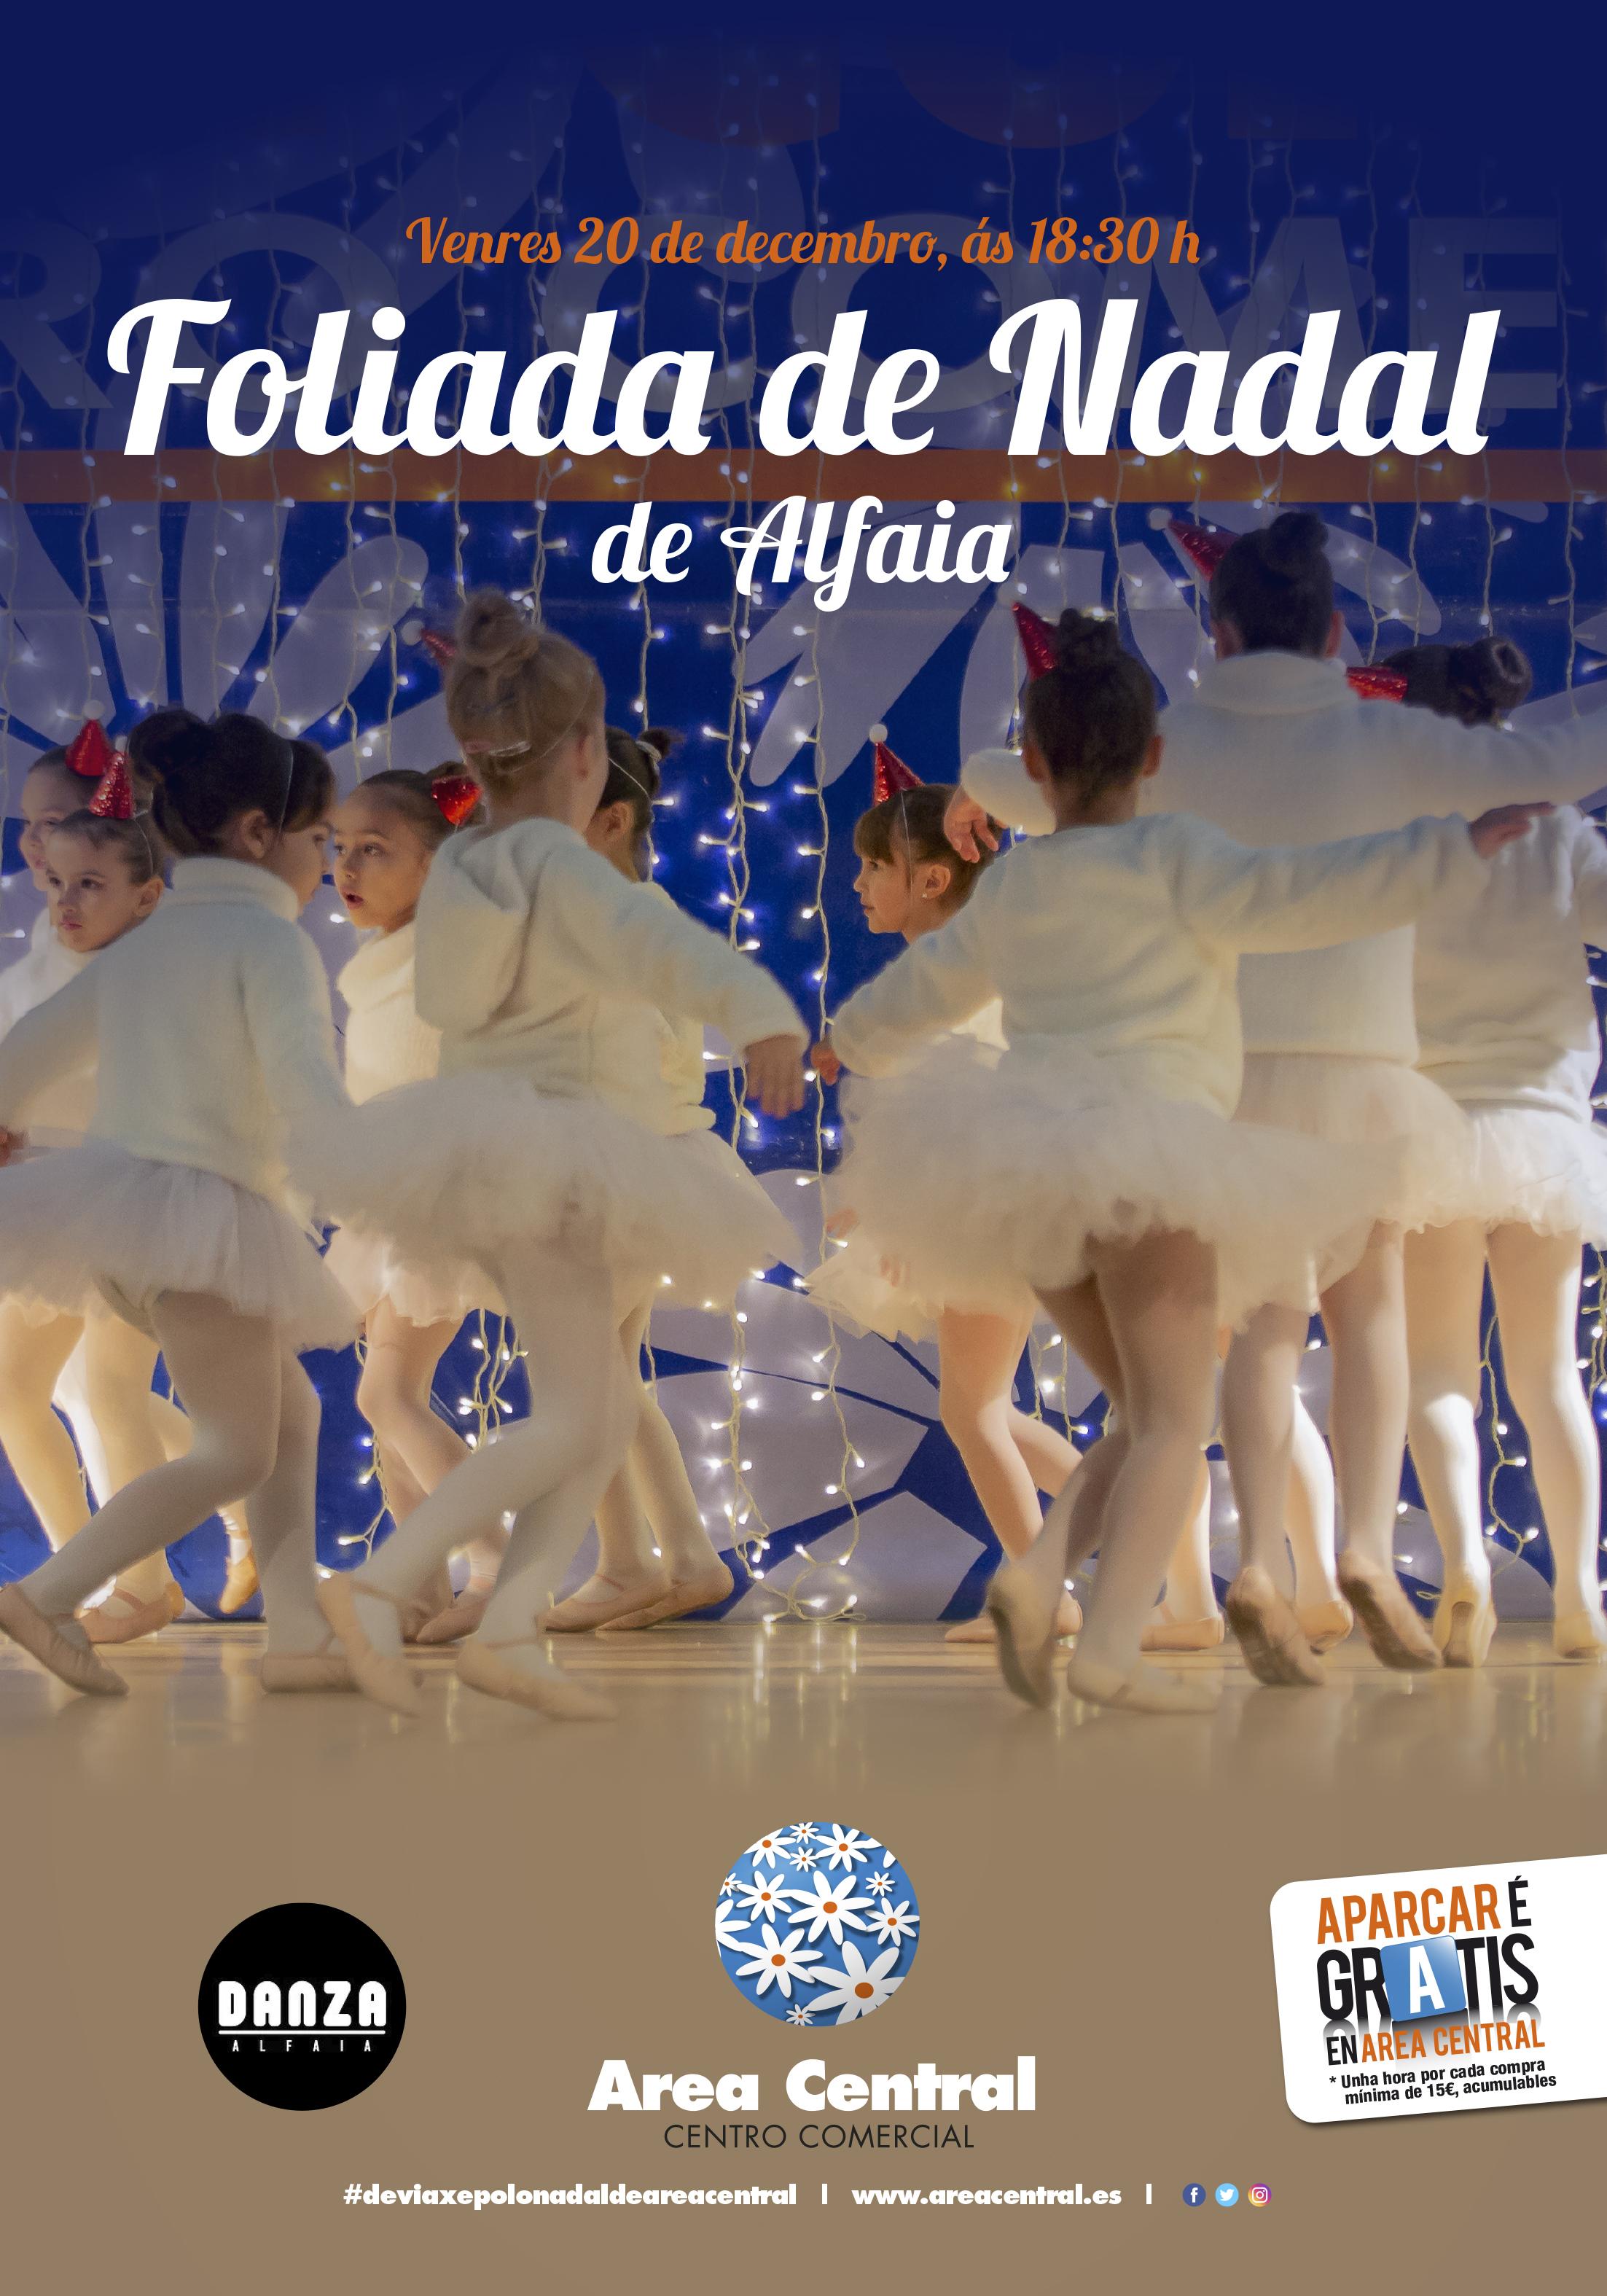 FOLIADA DE NADAL